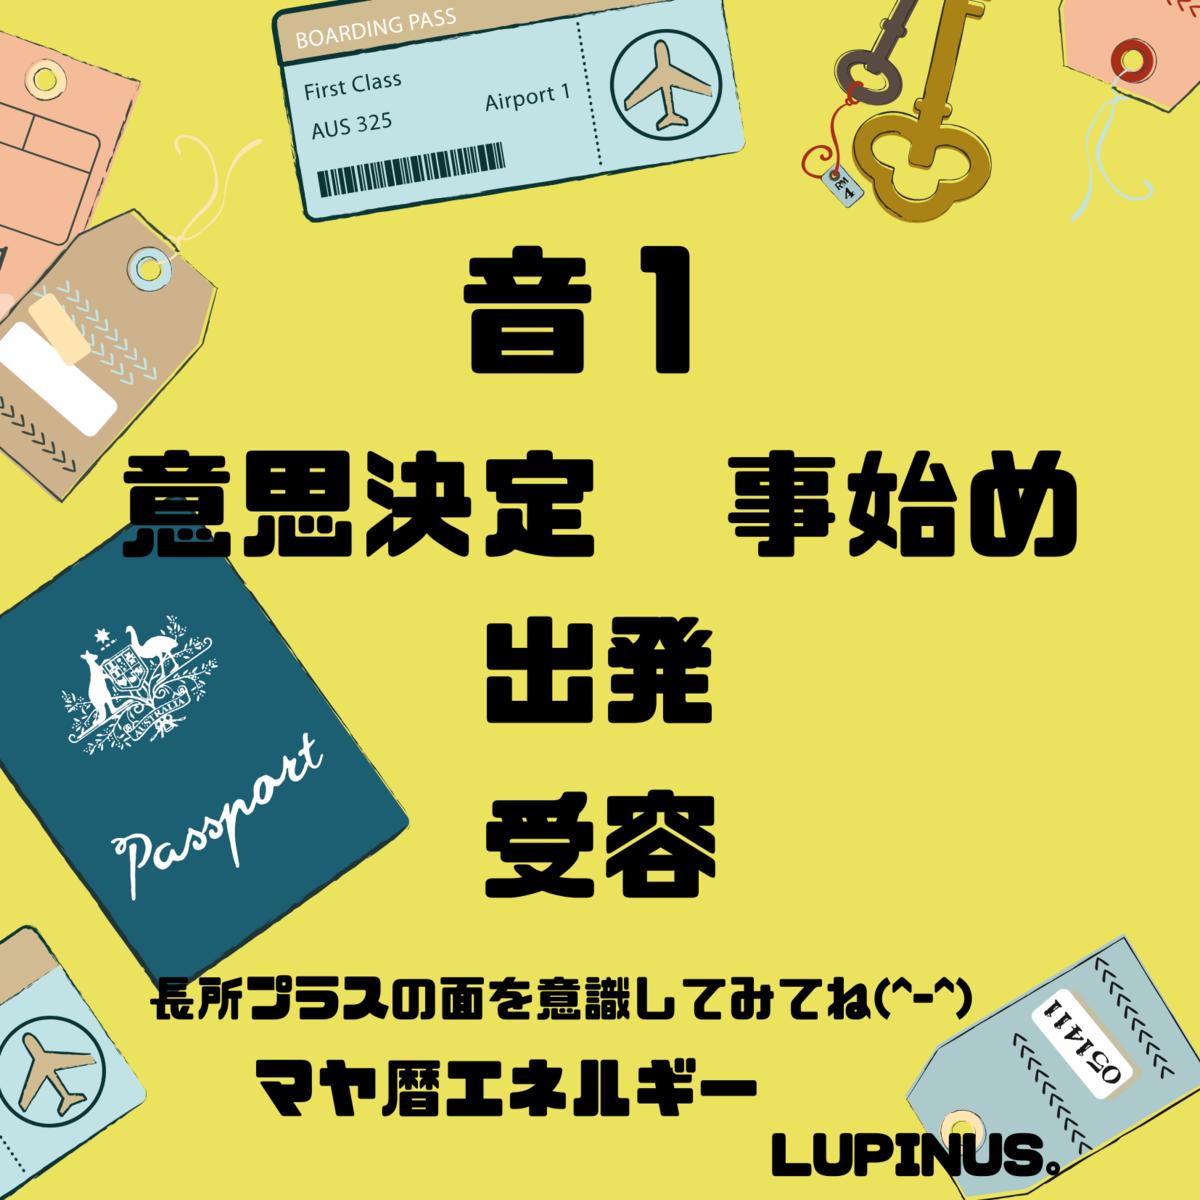 f:id:Lupinus104:20201116080849p:plain